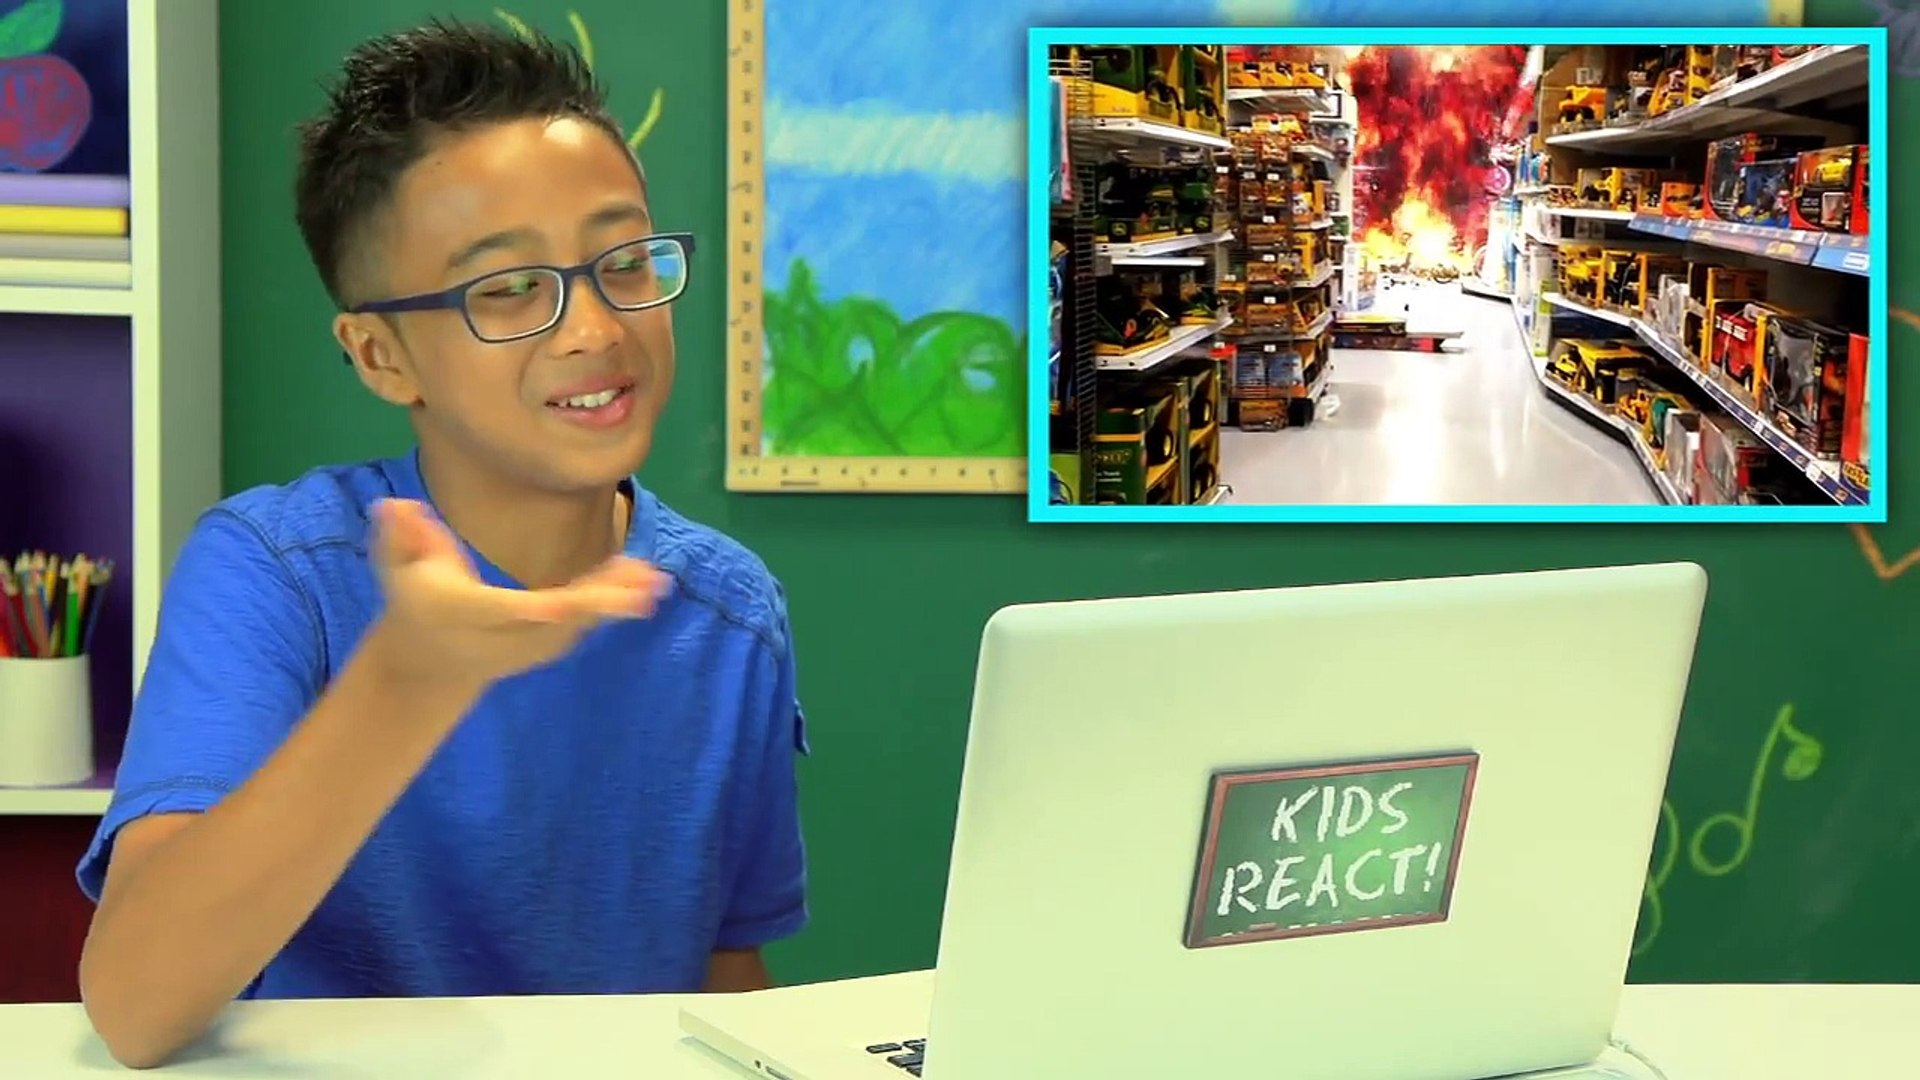 Kids React to Action Movie Kid (Bonus #112)